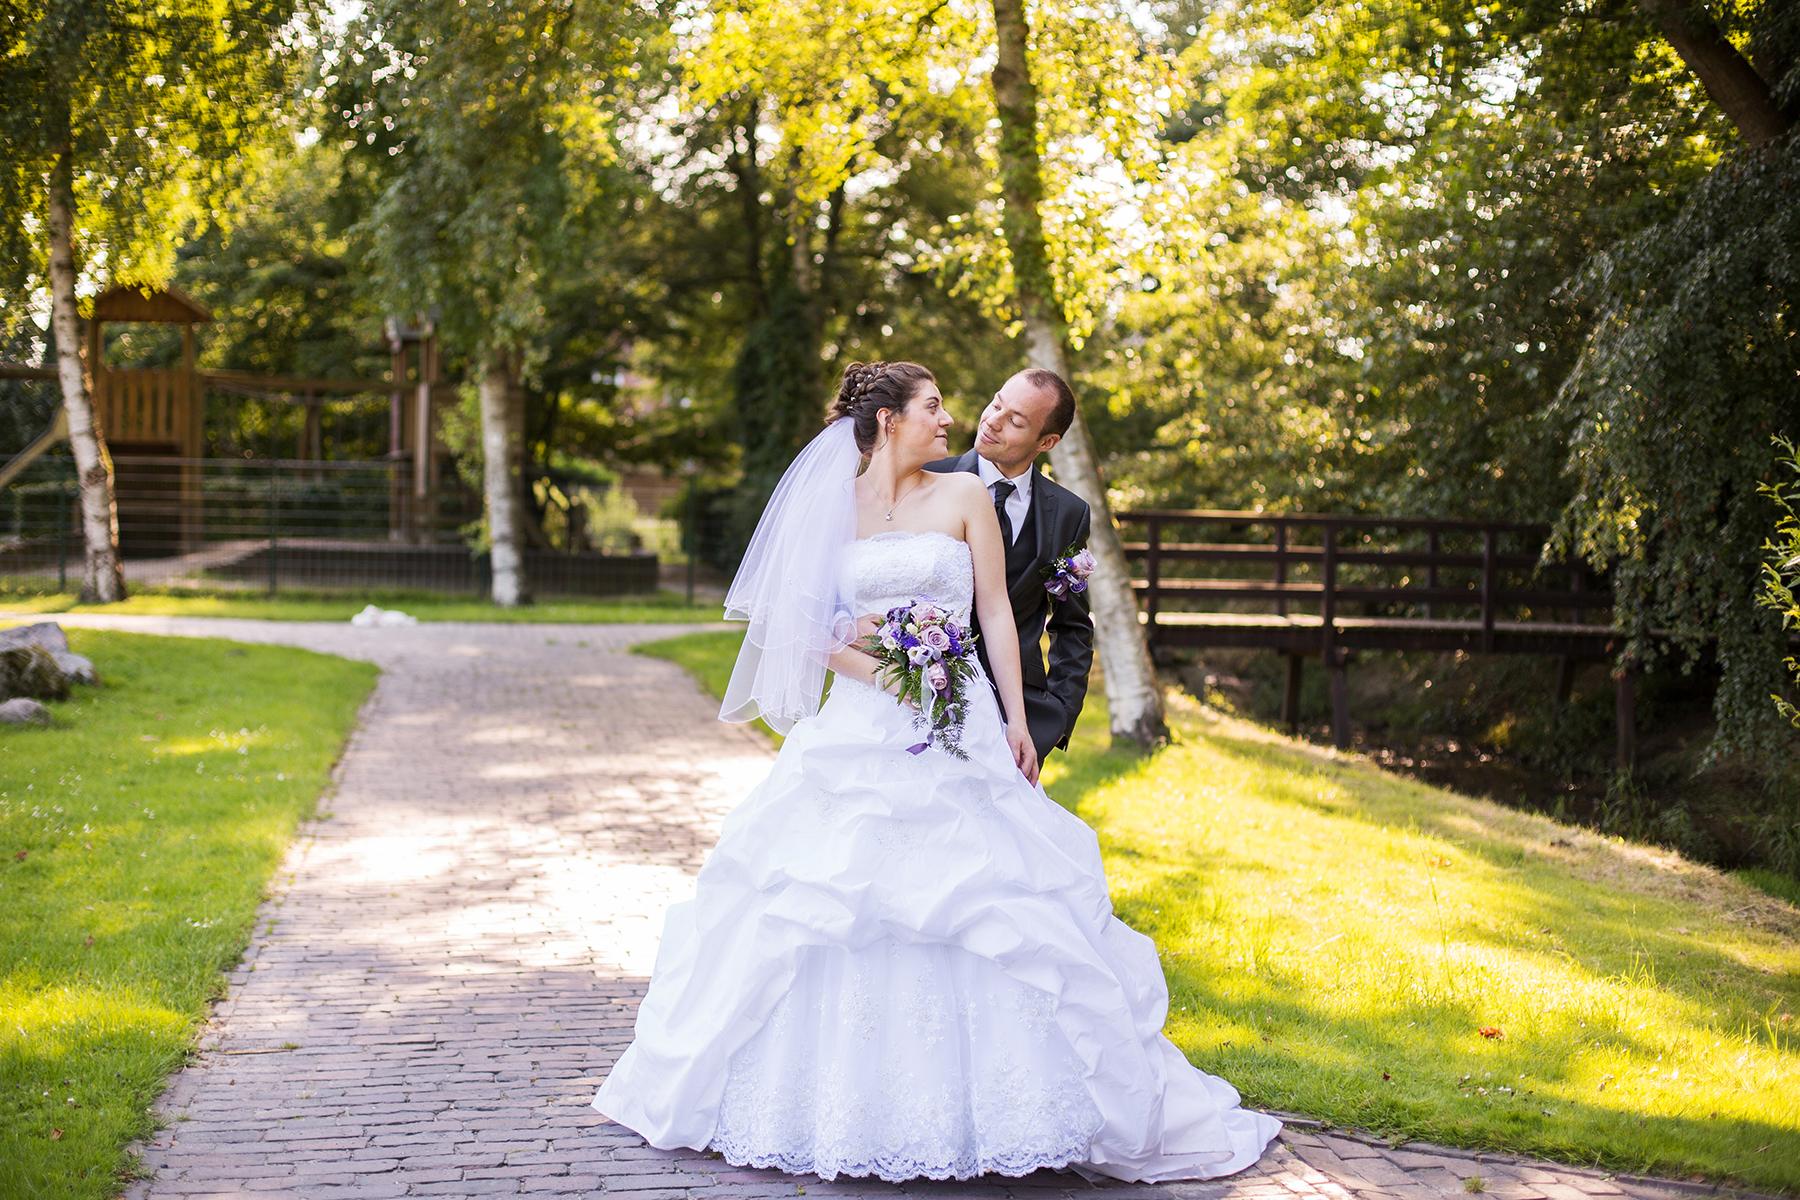 Brautpaarshooting-Domenica&Lars-090